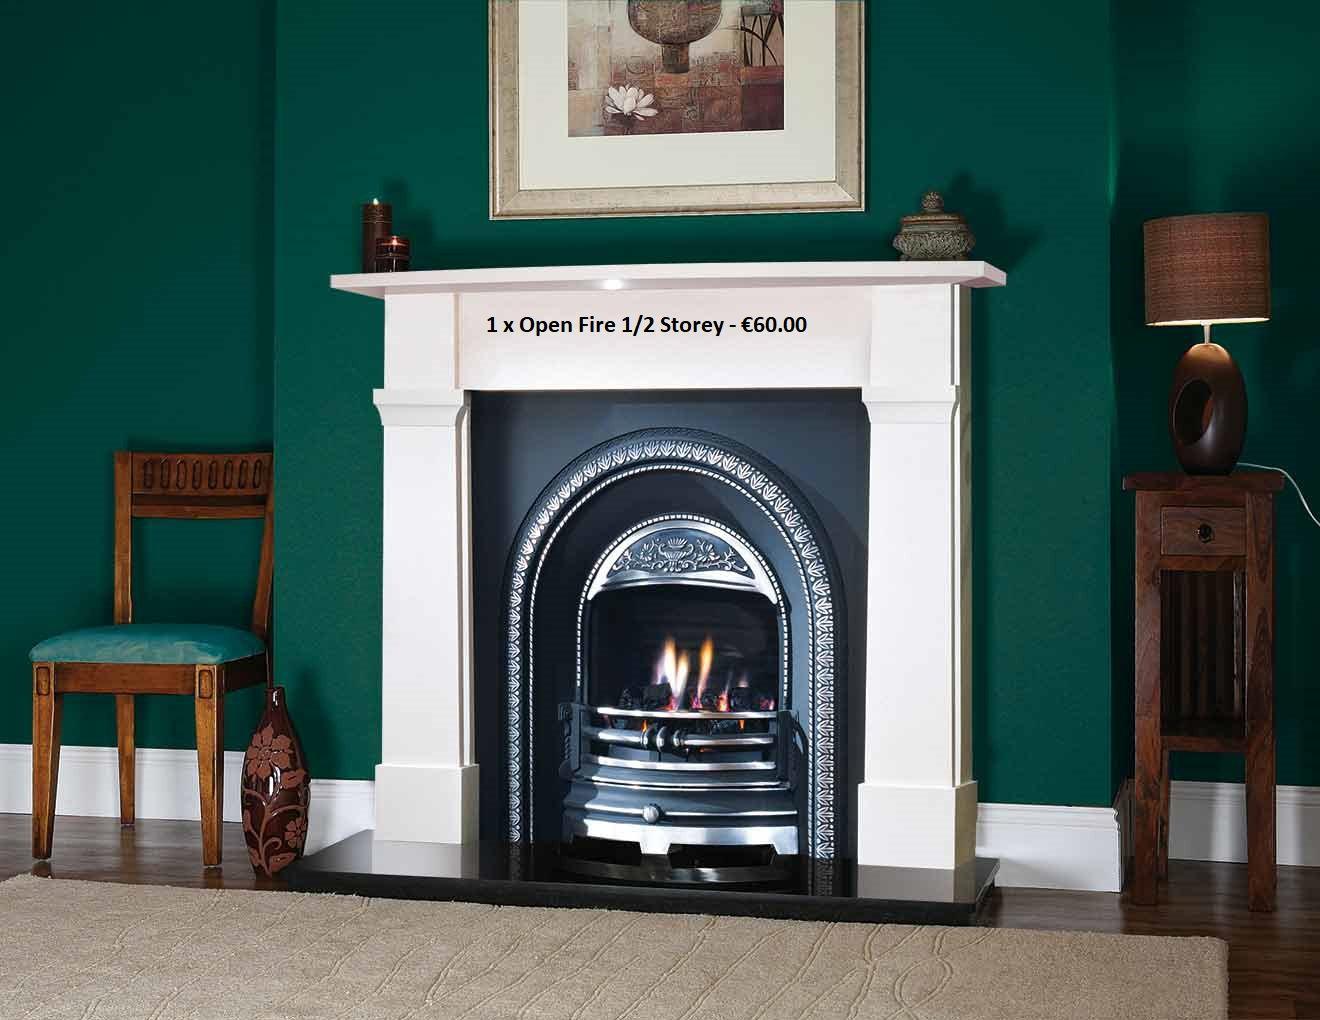 Chimney Sweep Open Fire 1/2 Storey